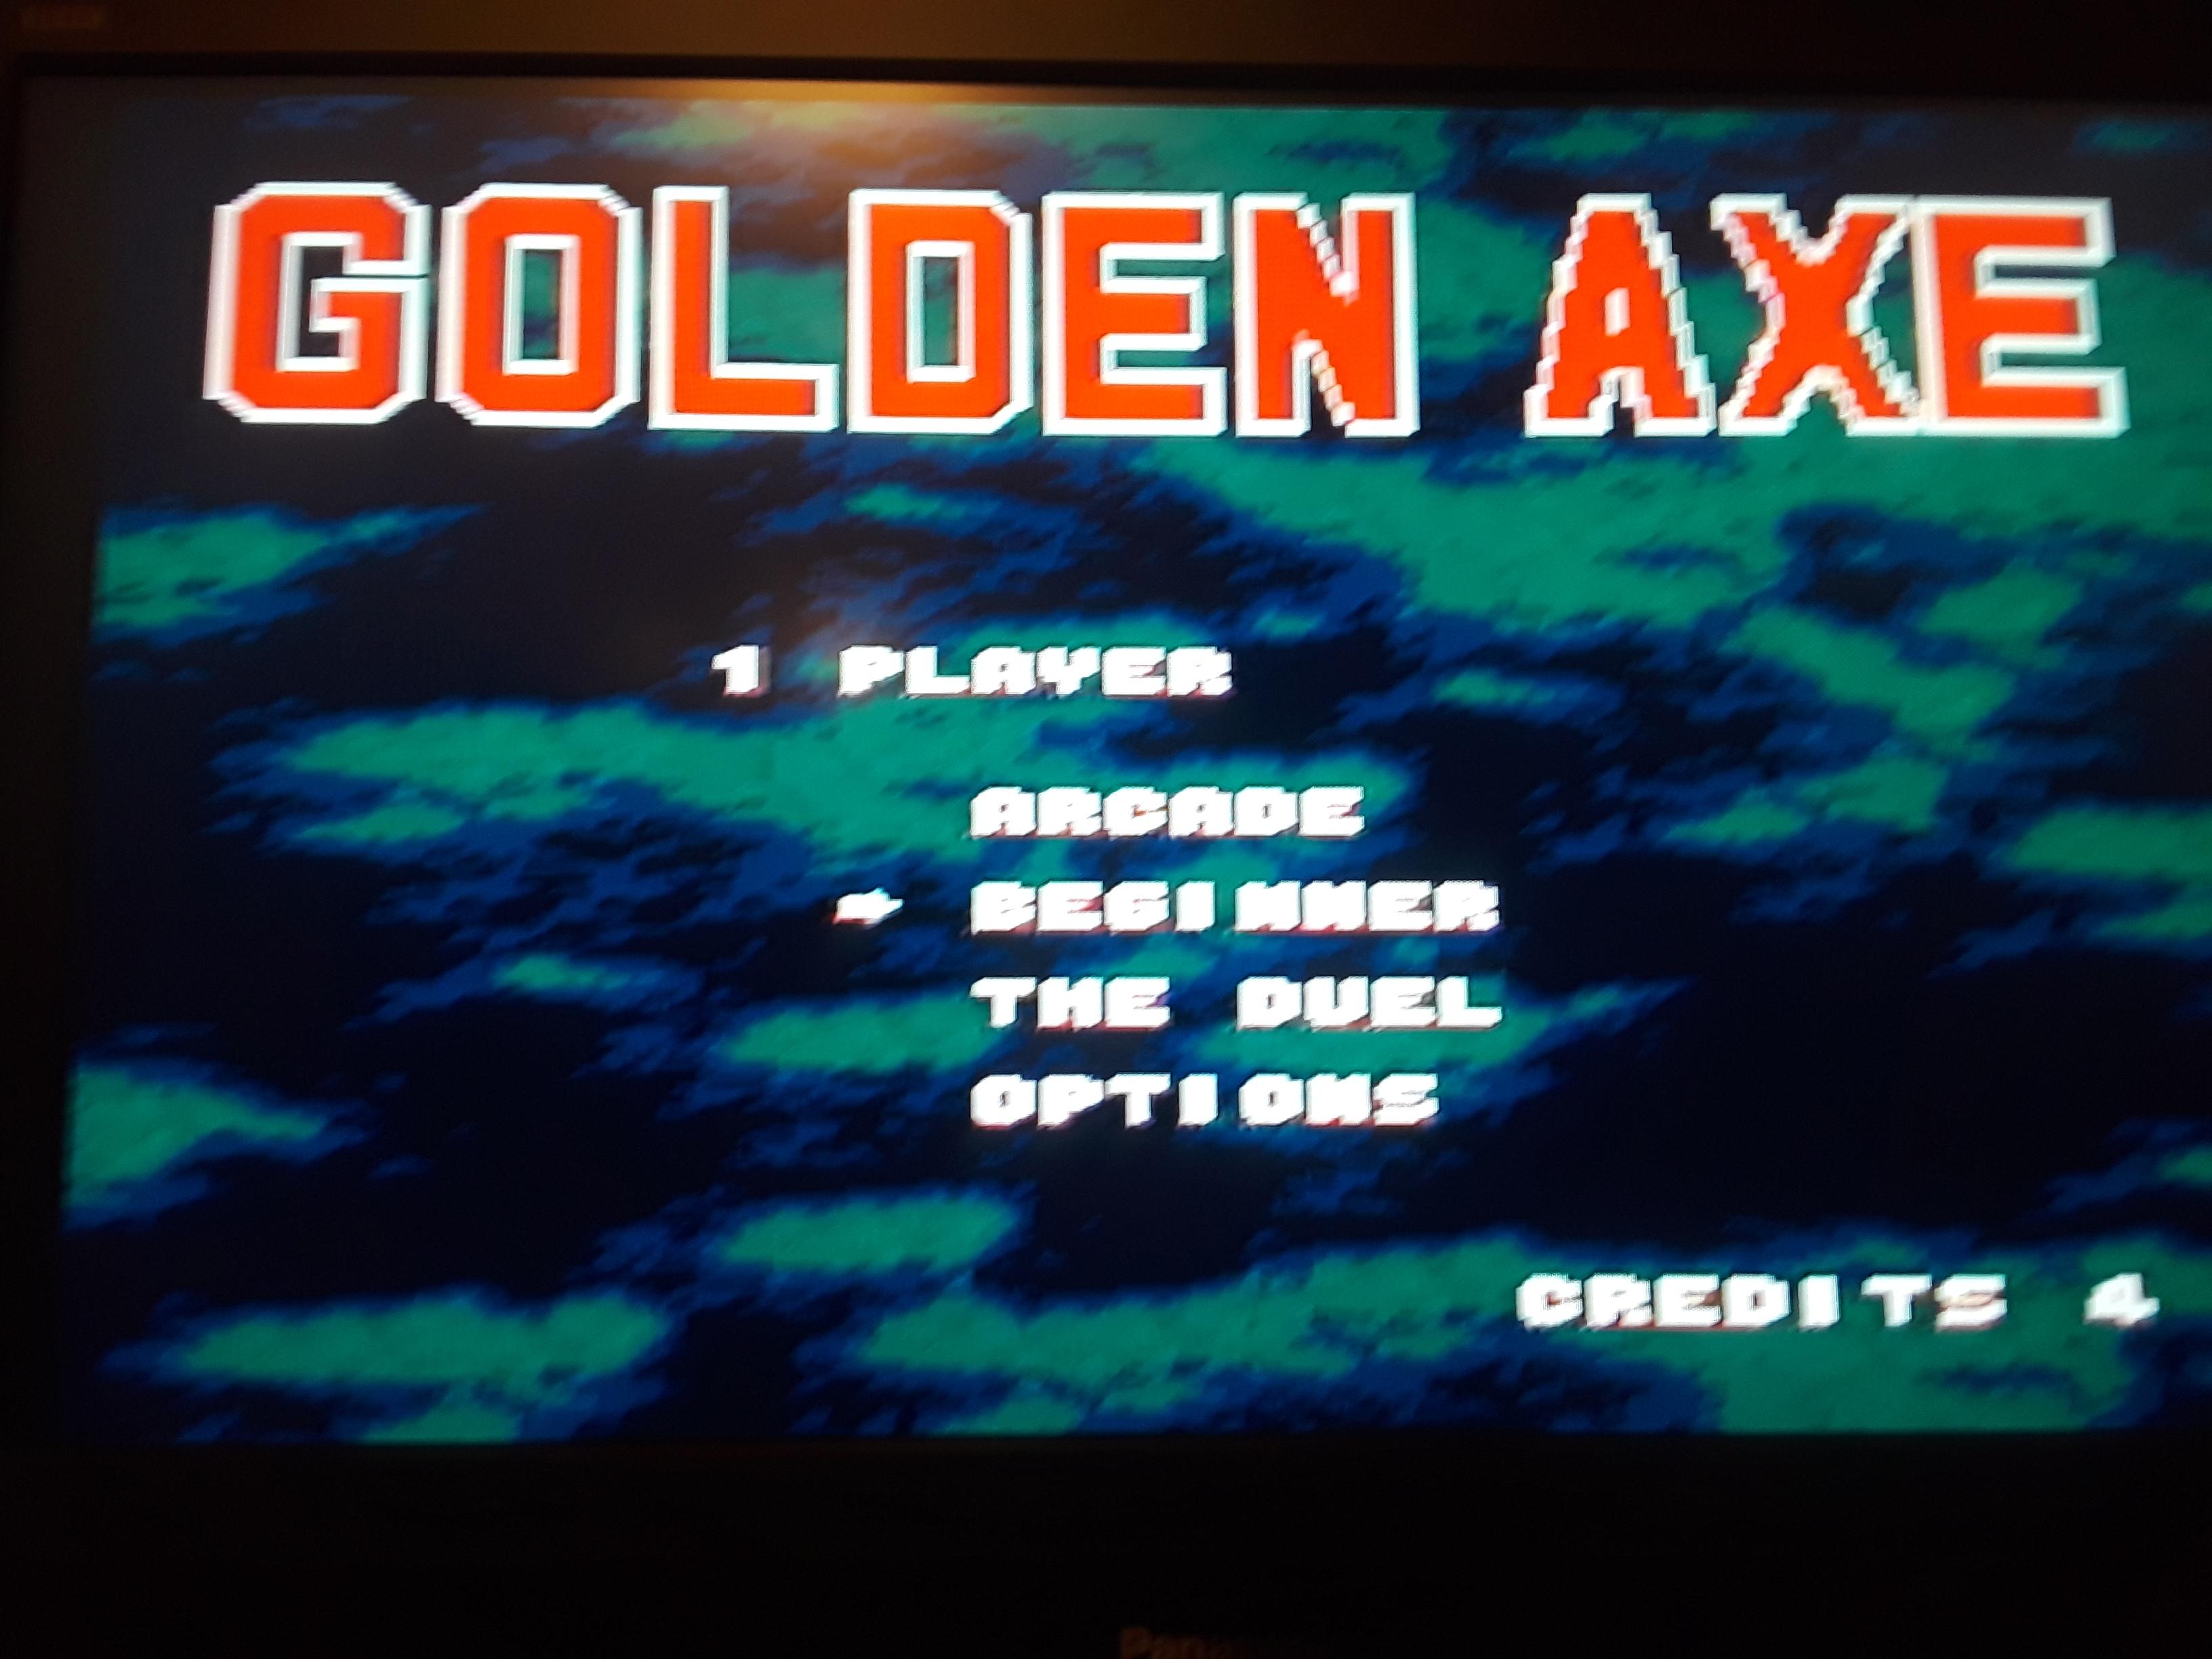 Golden Axe [Beginner] 79 points